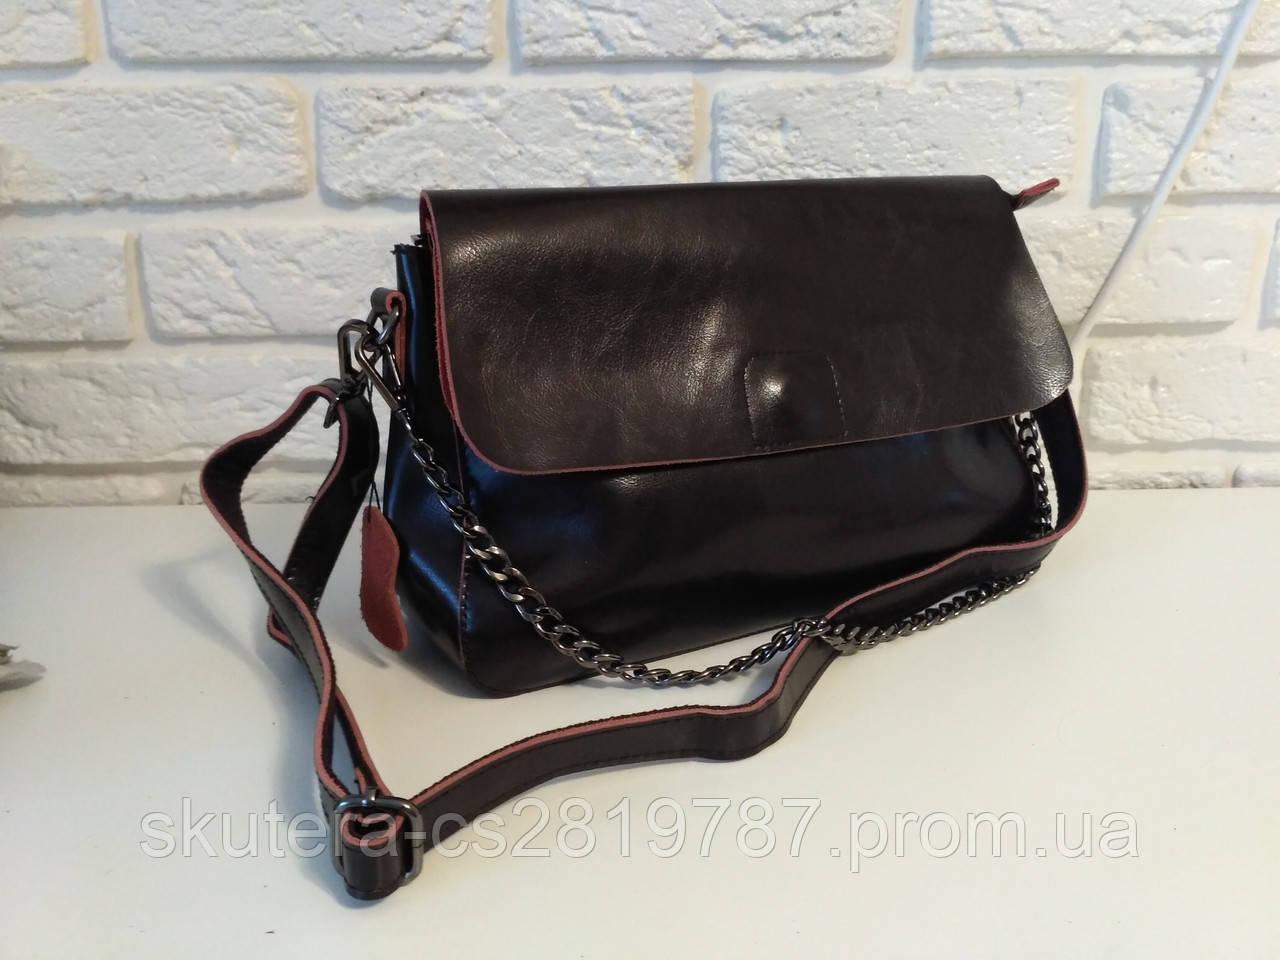 7e97ffaad0c9 Женская кожаная сумка